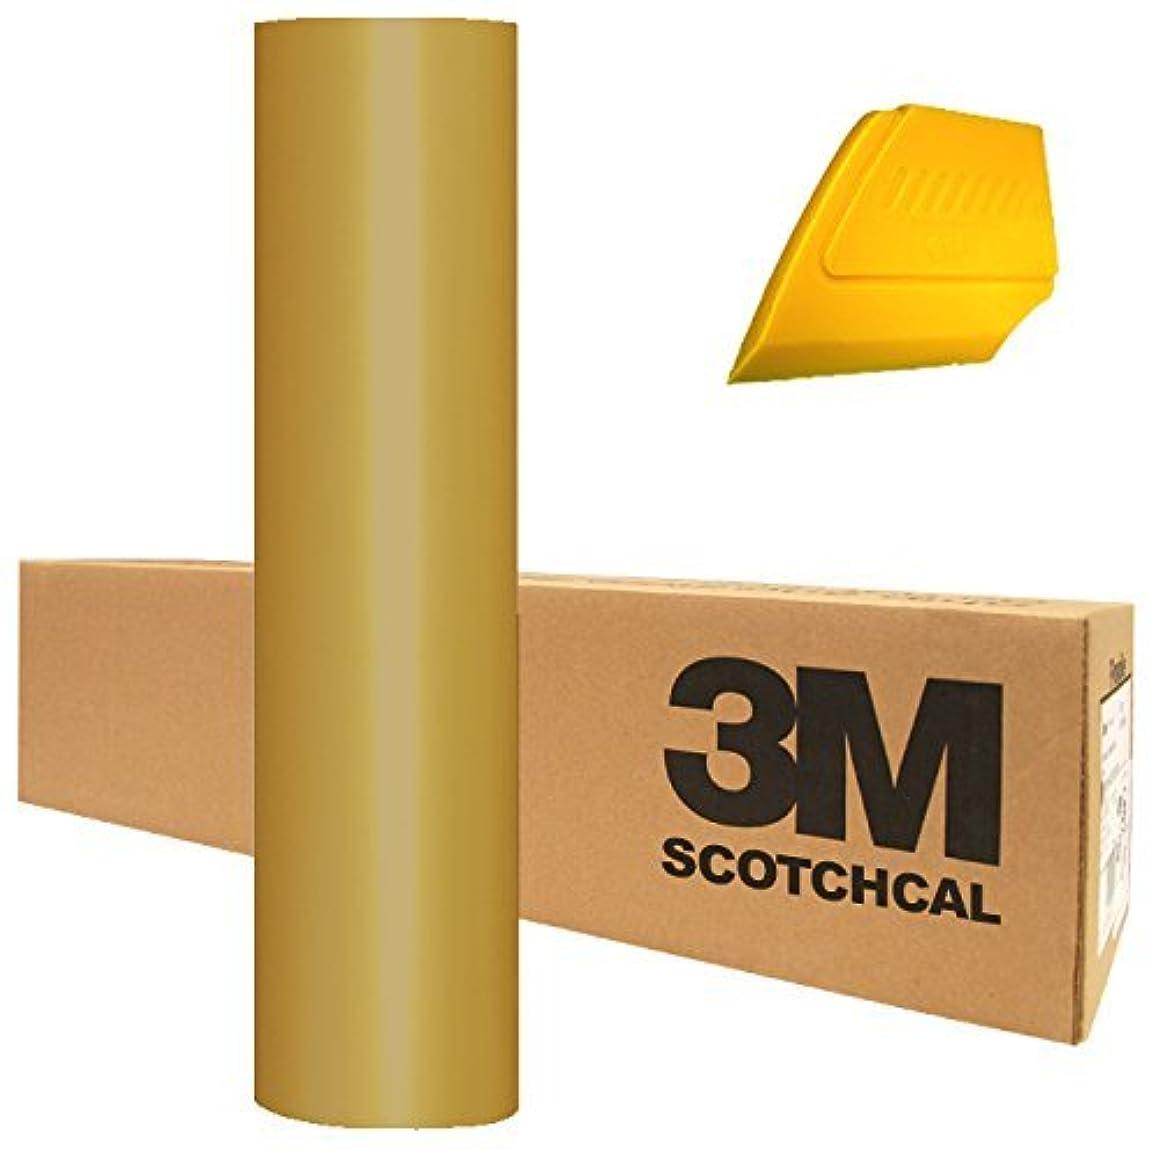 3M Scotchcal Electrocut Gloss Adhesive Graphic Vinyl Film 12